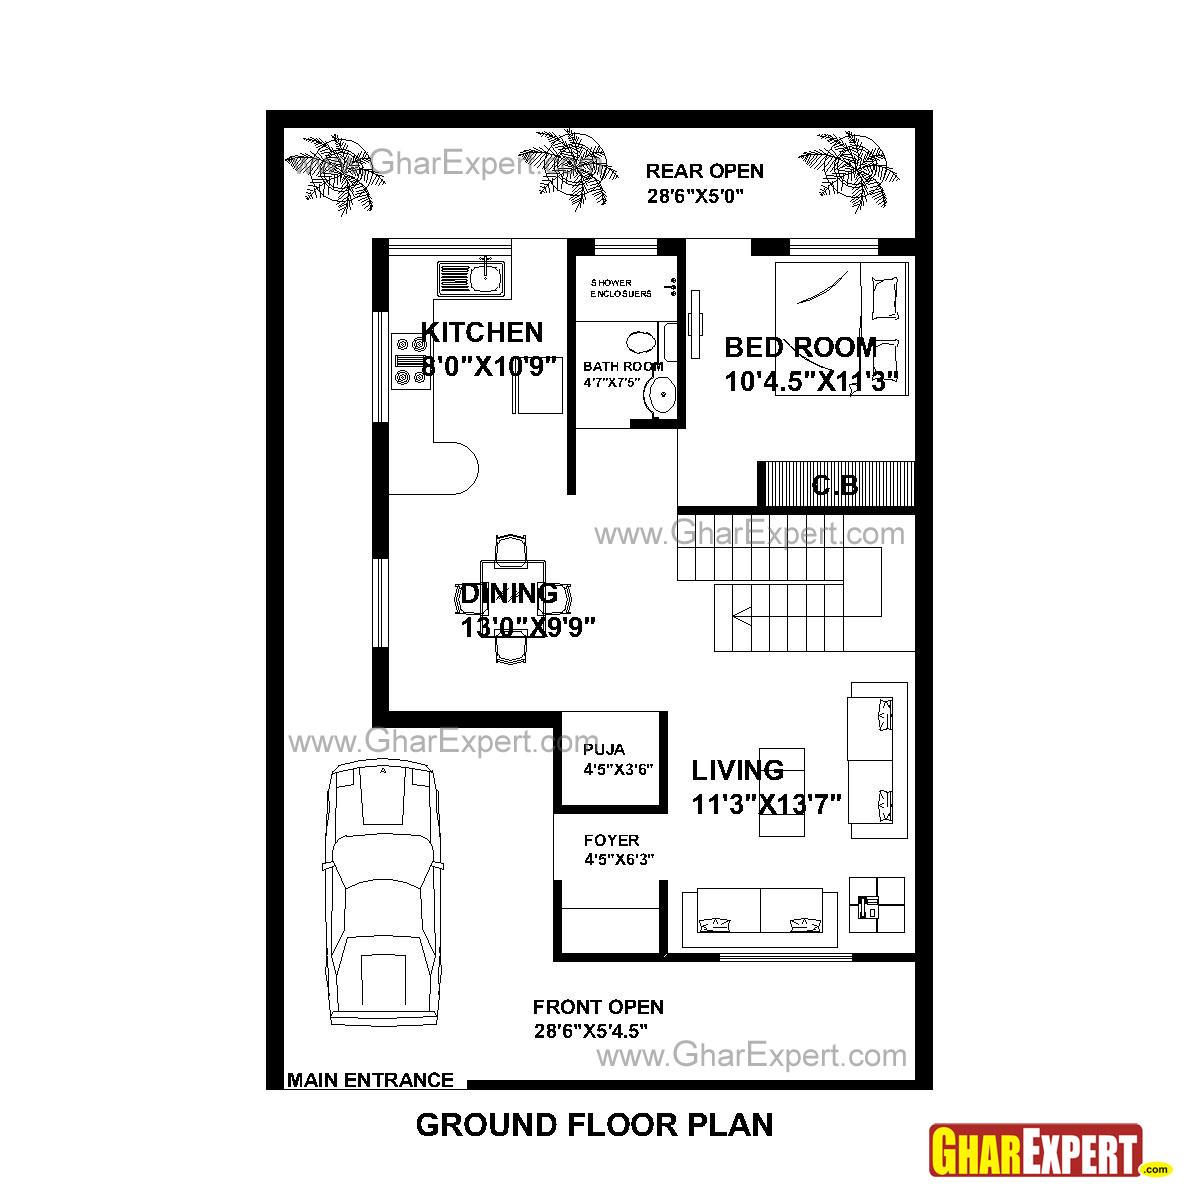 House Plan for 30 Feet by 44 Feet plot (Plot Size 147